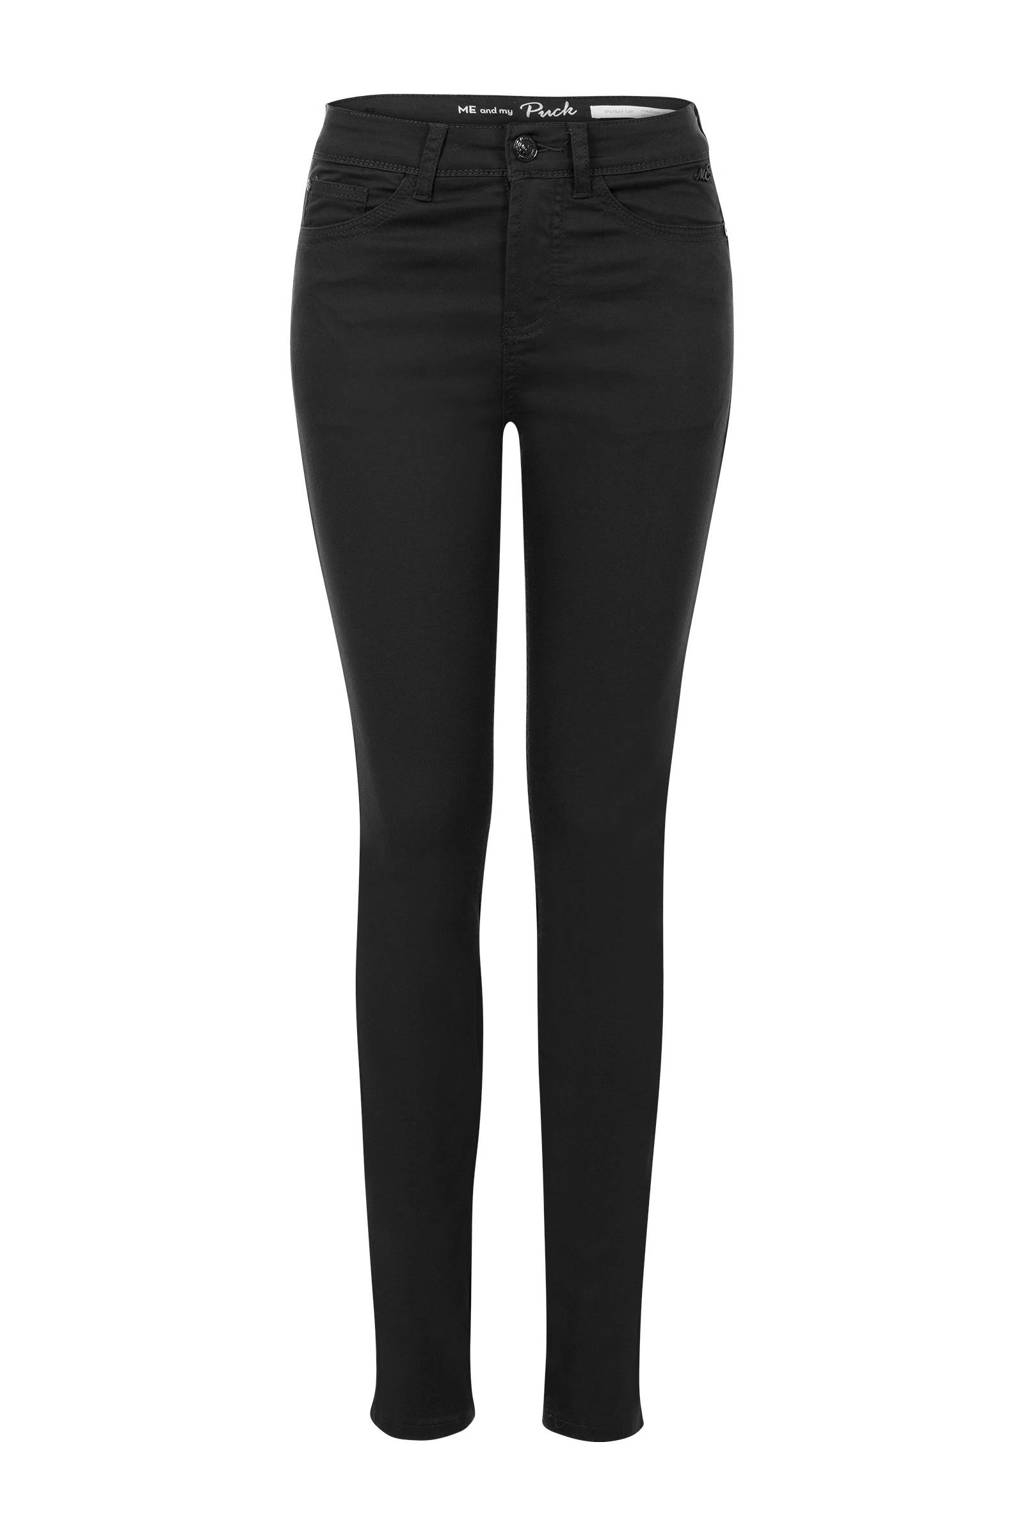 Miss Etam Regulier skinny fit broek 32 inch zwart, Zwart